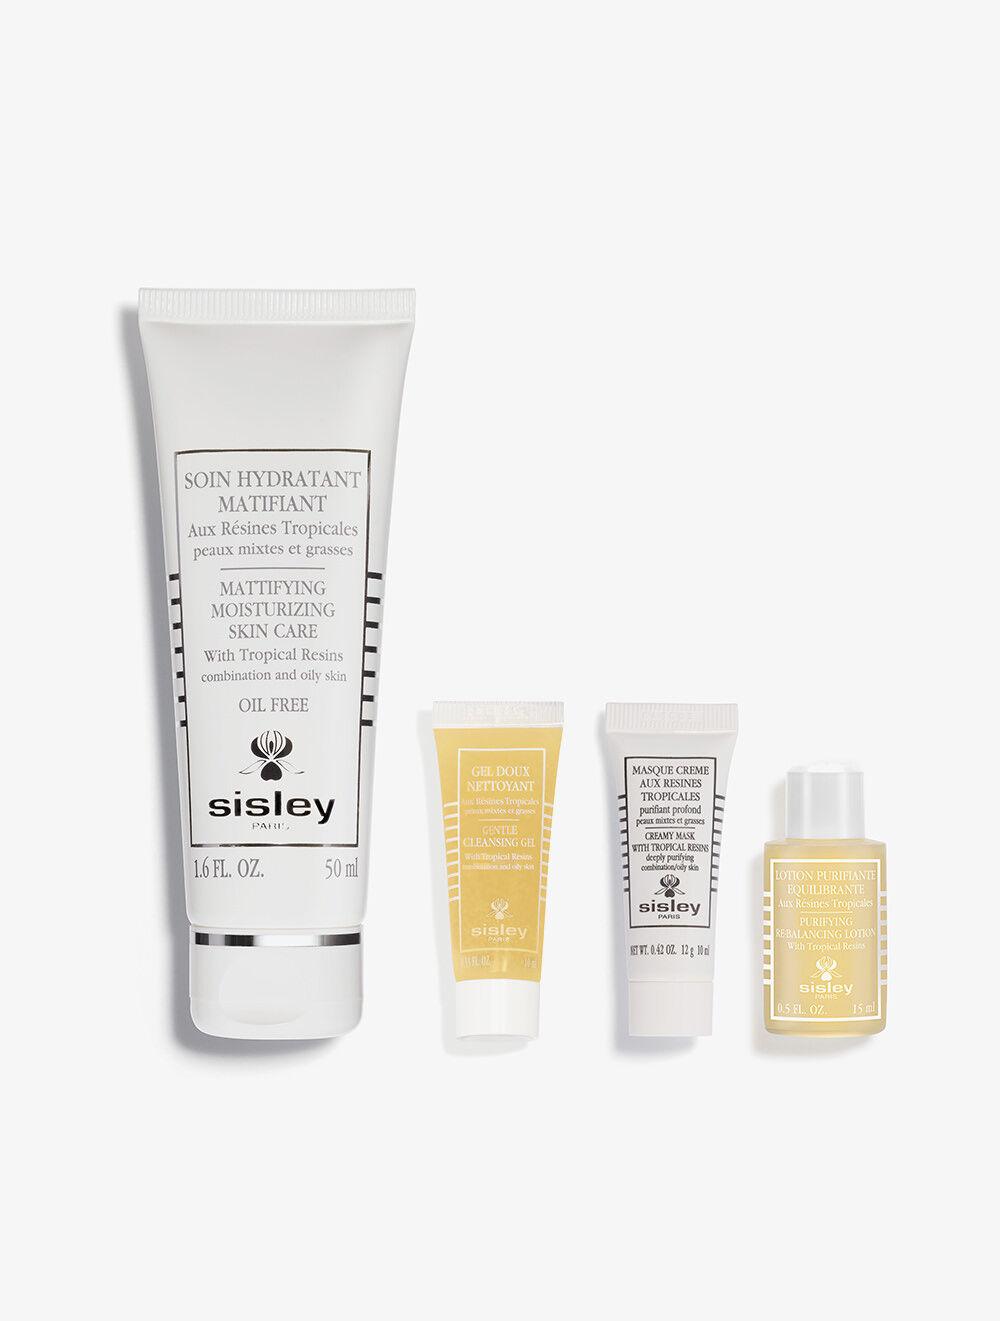 Mattifying Moisturizing Skin Care Discovery Program